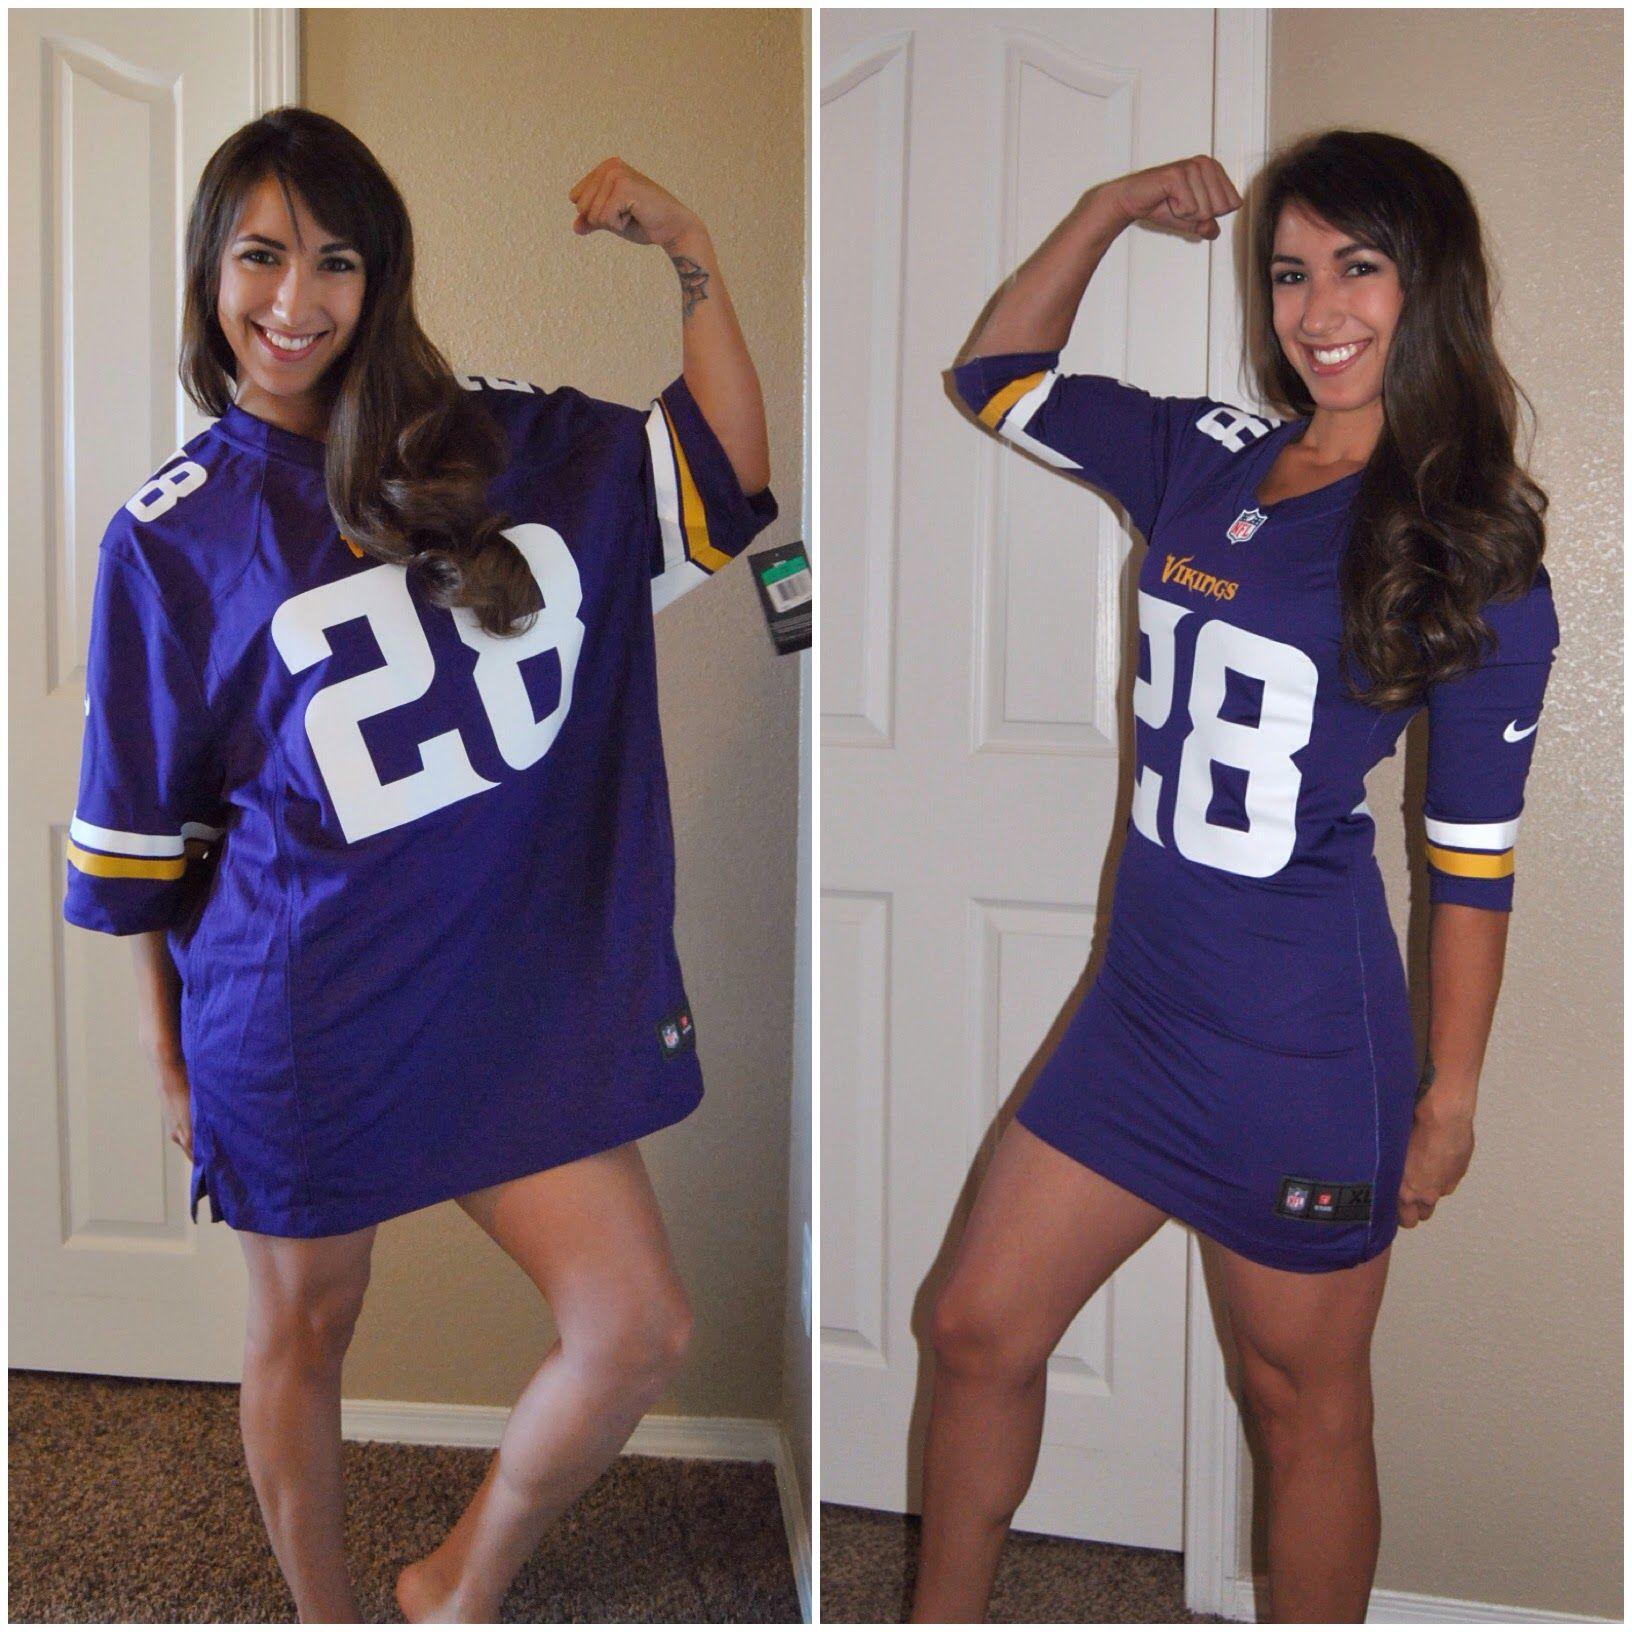 Football jerseys for girls football jersey outfit